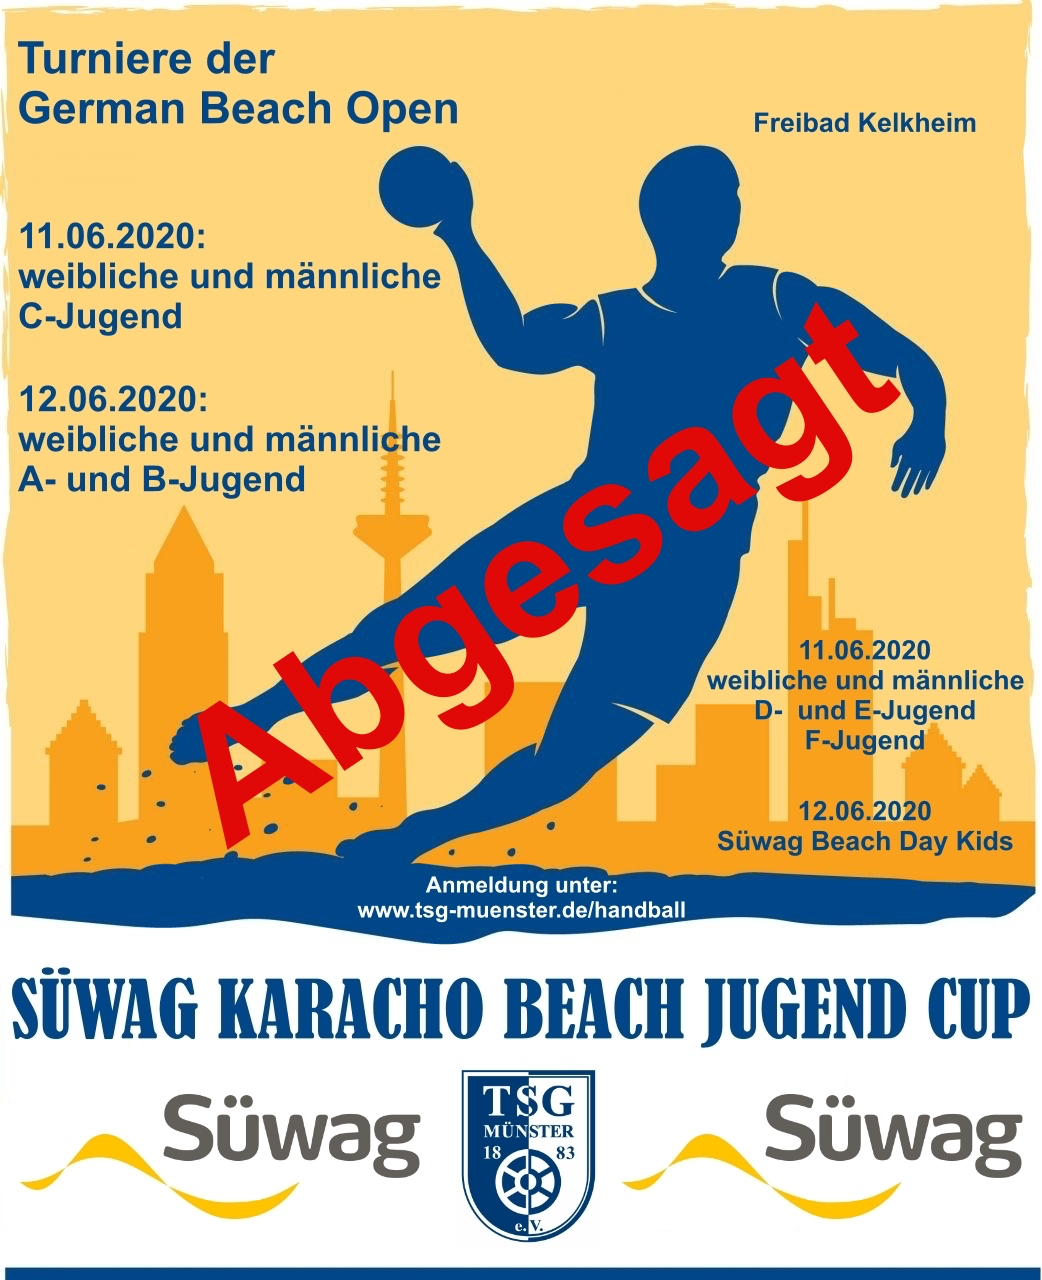 2020-03-02 Süwag Karacho Beach Jugend Cup Web